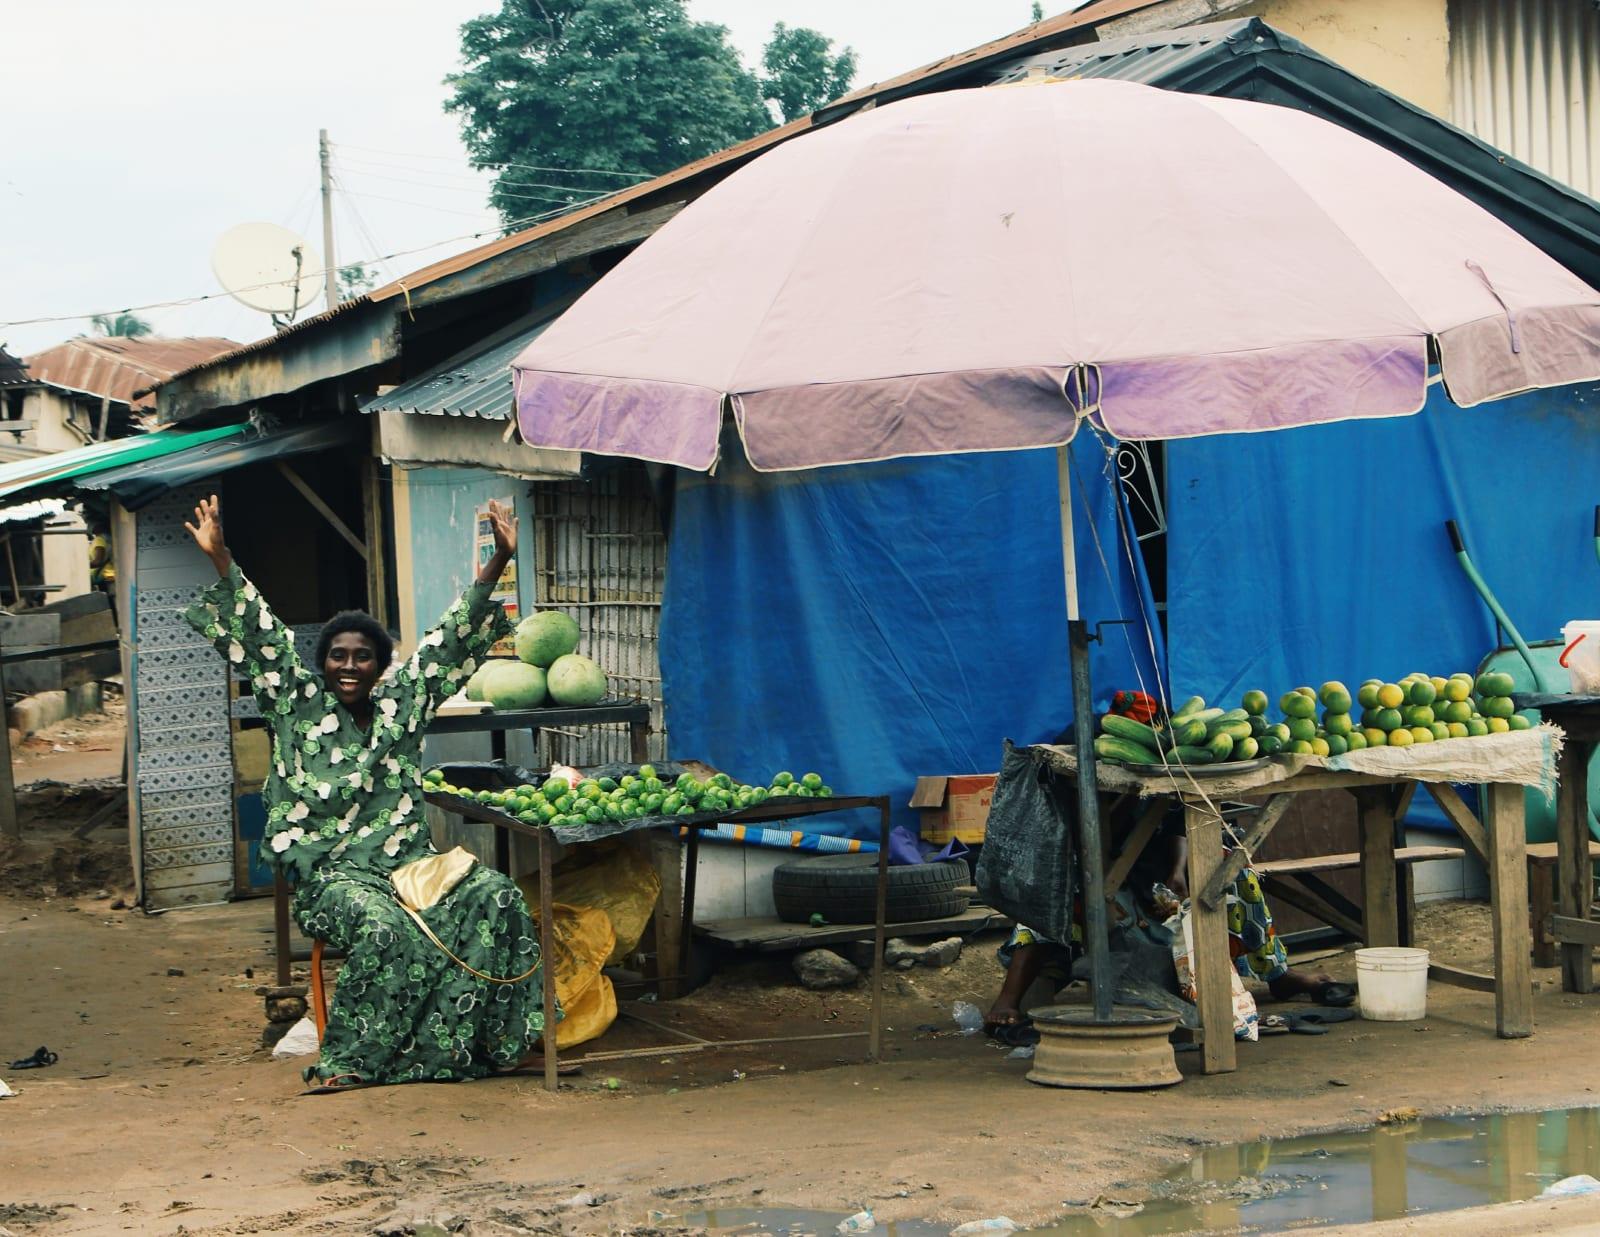 Arinzechukwu Patrick A market woman 38.24 x 29.7 cm 27.16 x 21 cm Digital print